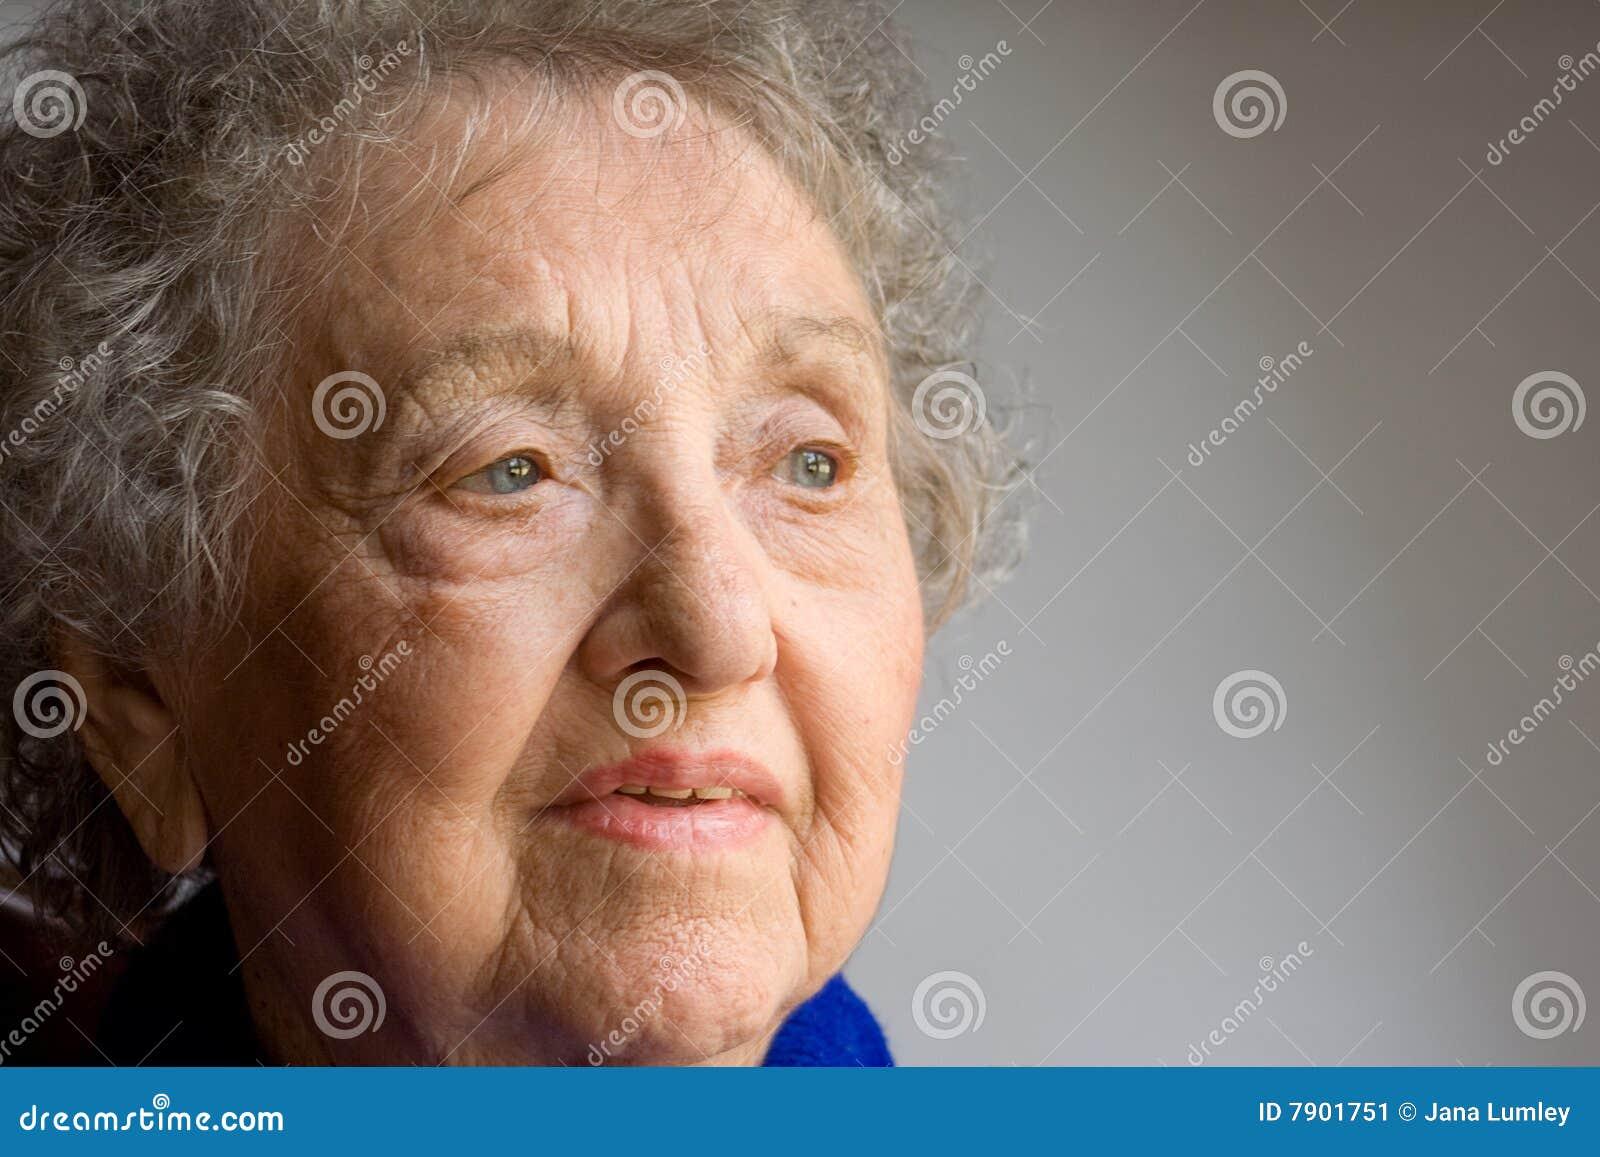 Elderly Woman Portrait Stock Image - Image: 7901751